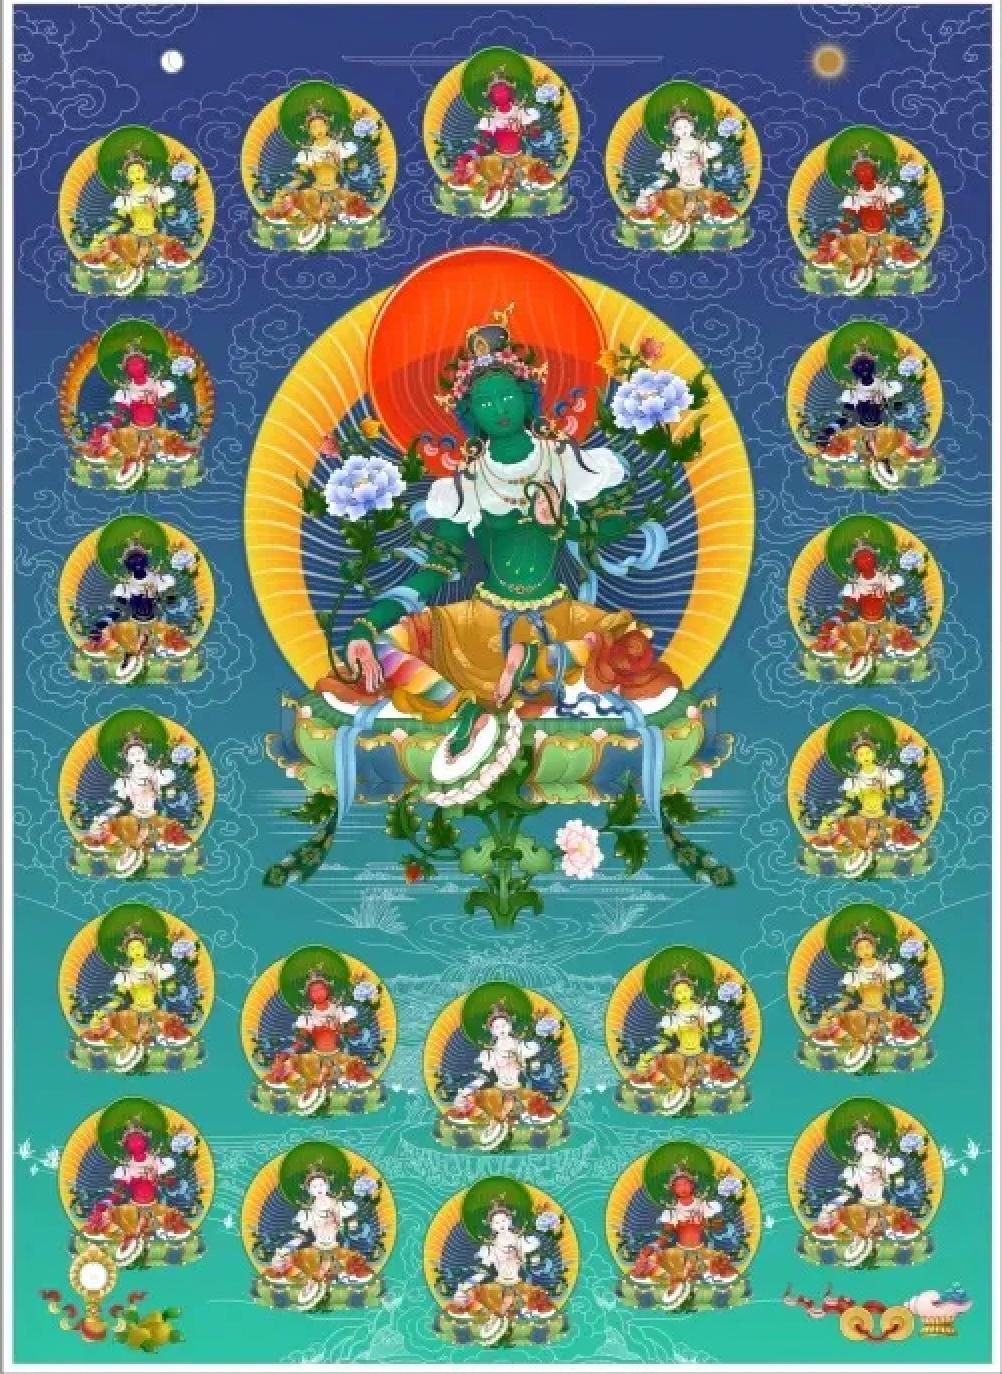 21 TARAS, TEACHING AND INITIATION – Khenpo Tashi Sangpo